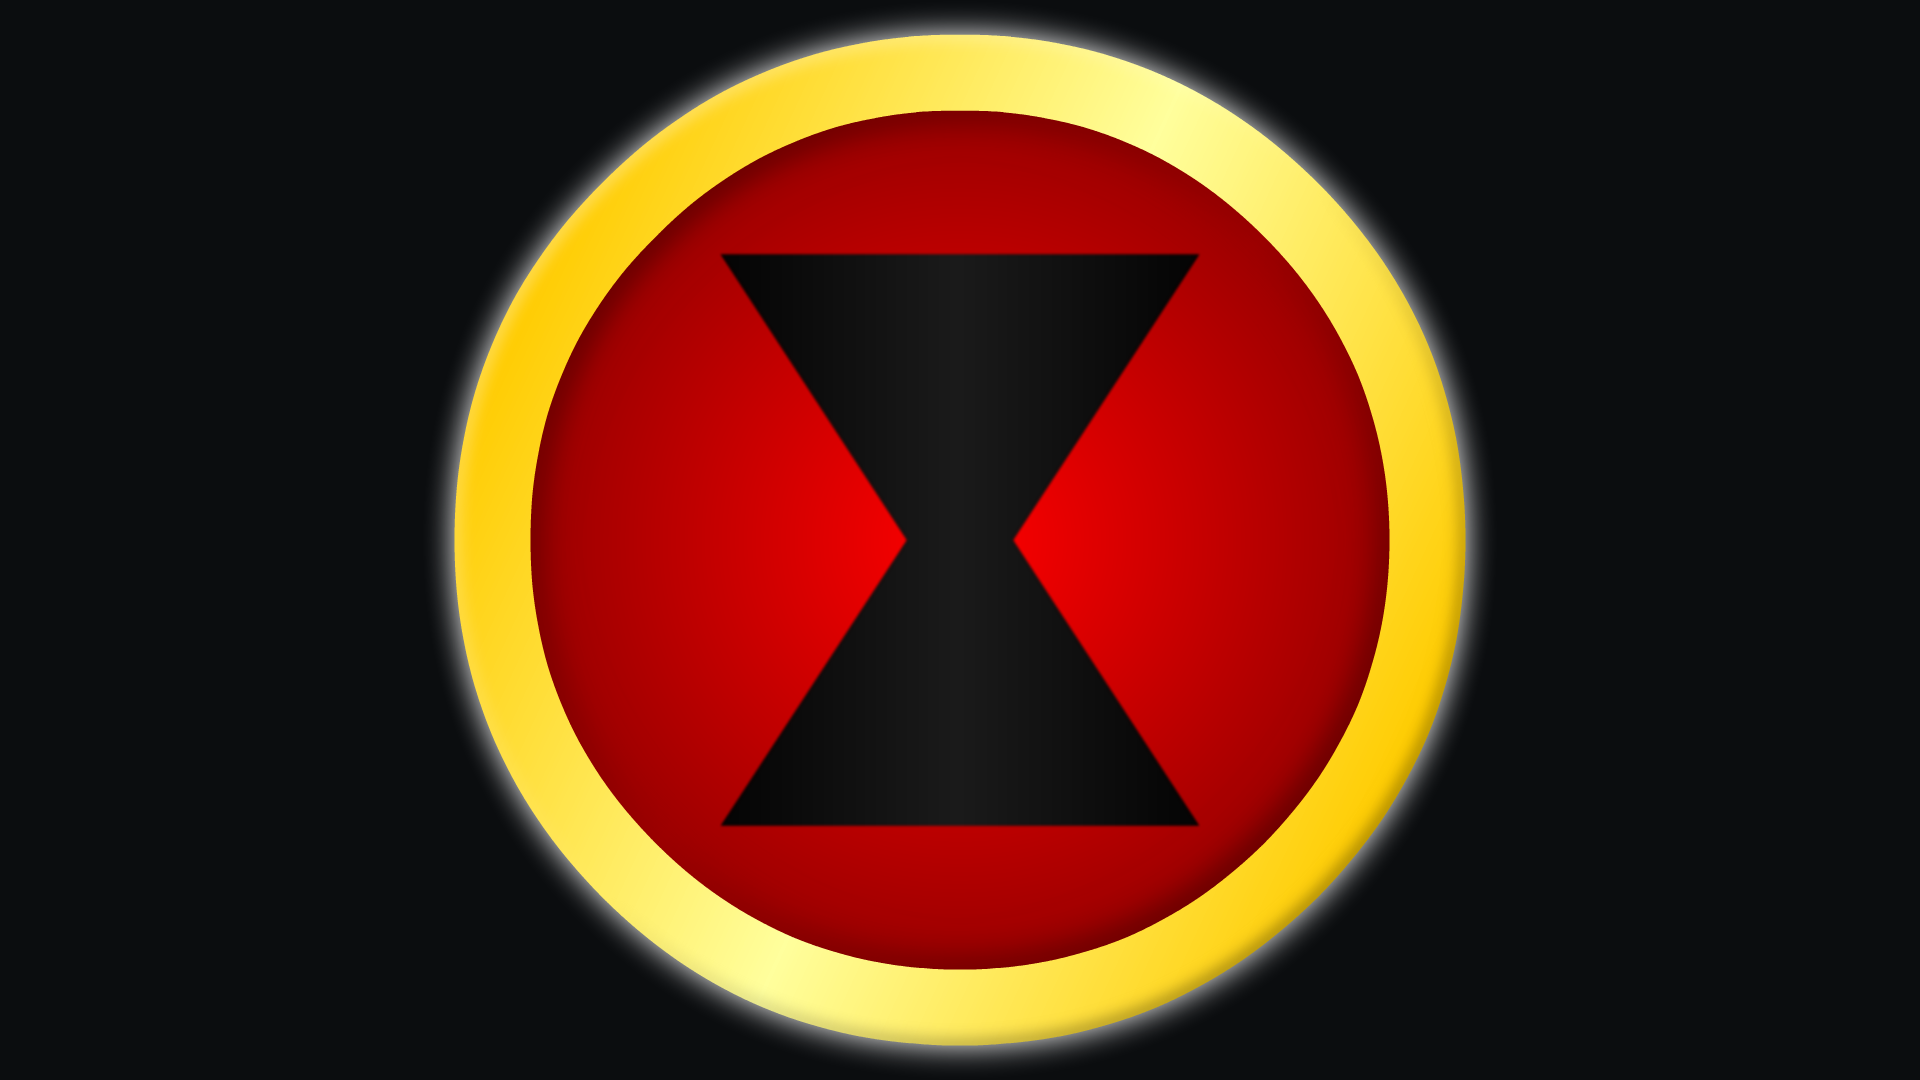 Black Widow Symbol By Yurtigo On Deviantart